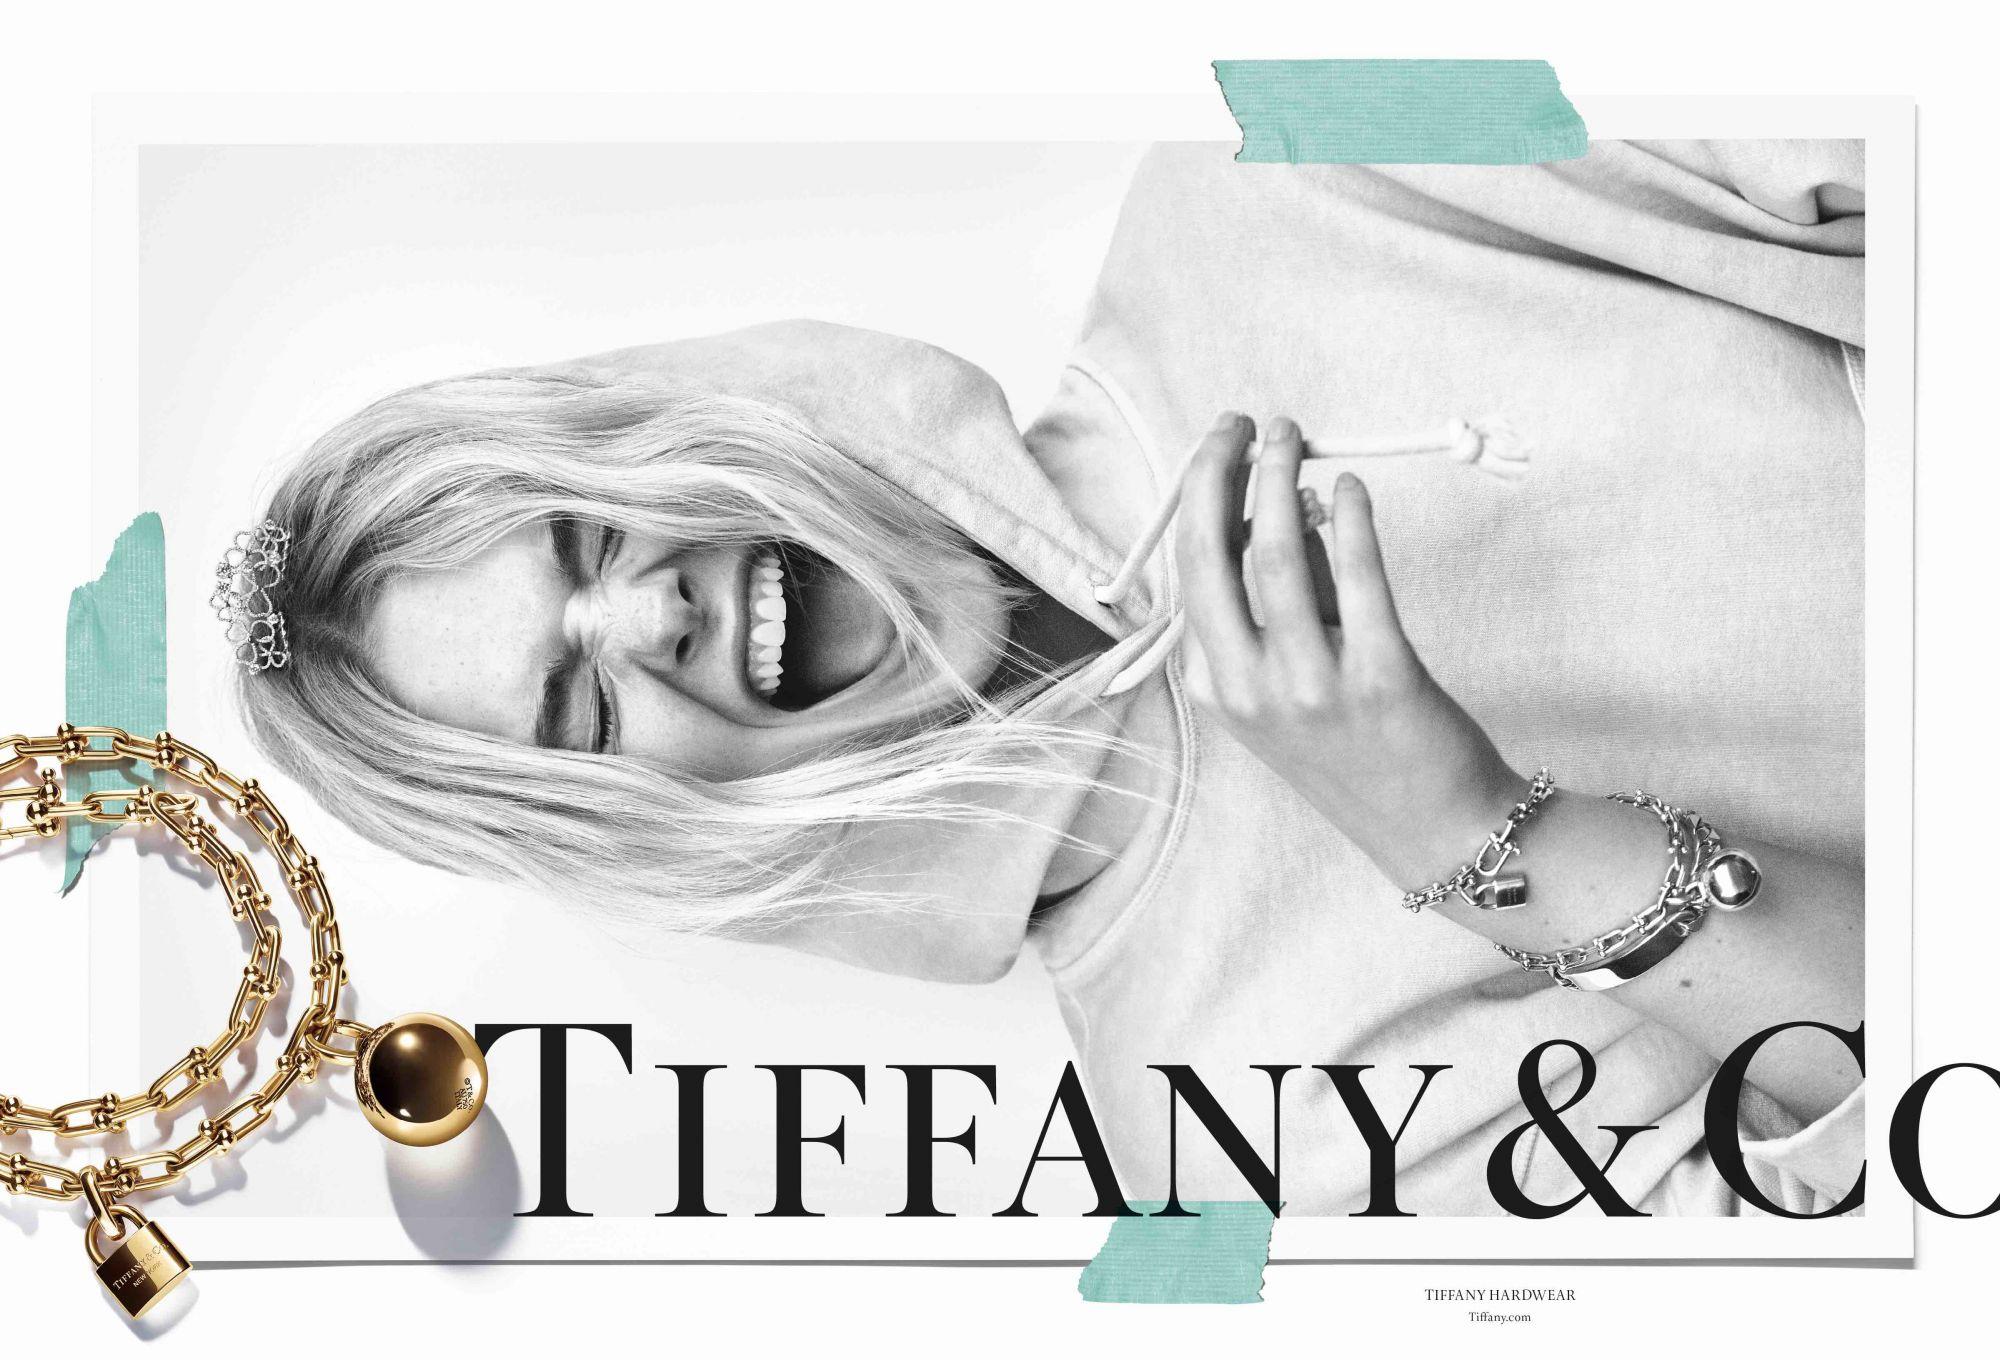 Tiffany & Co Wants You To Believe In Dreams